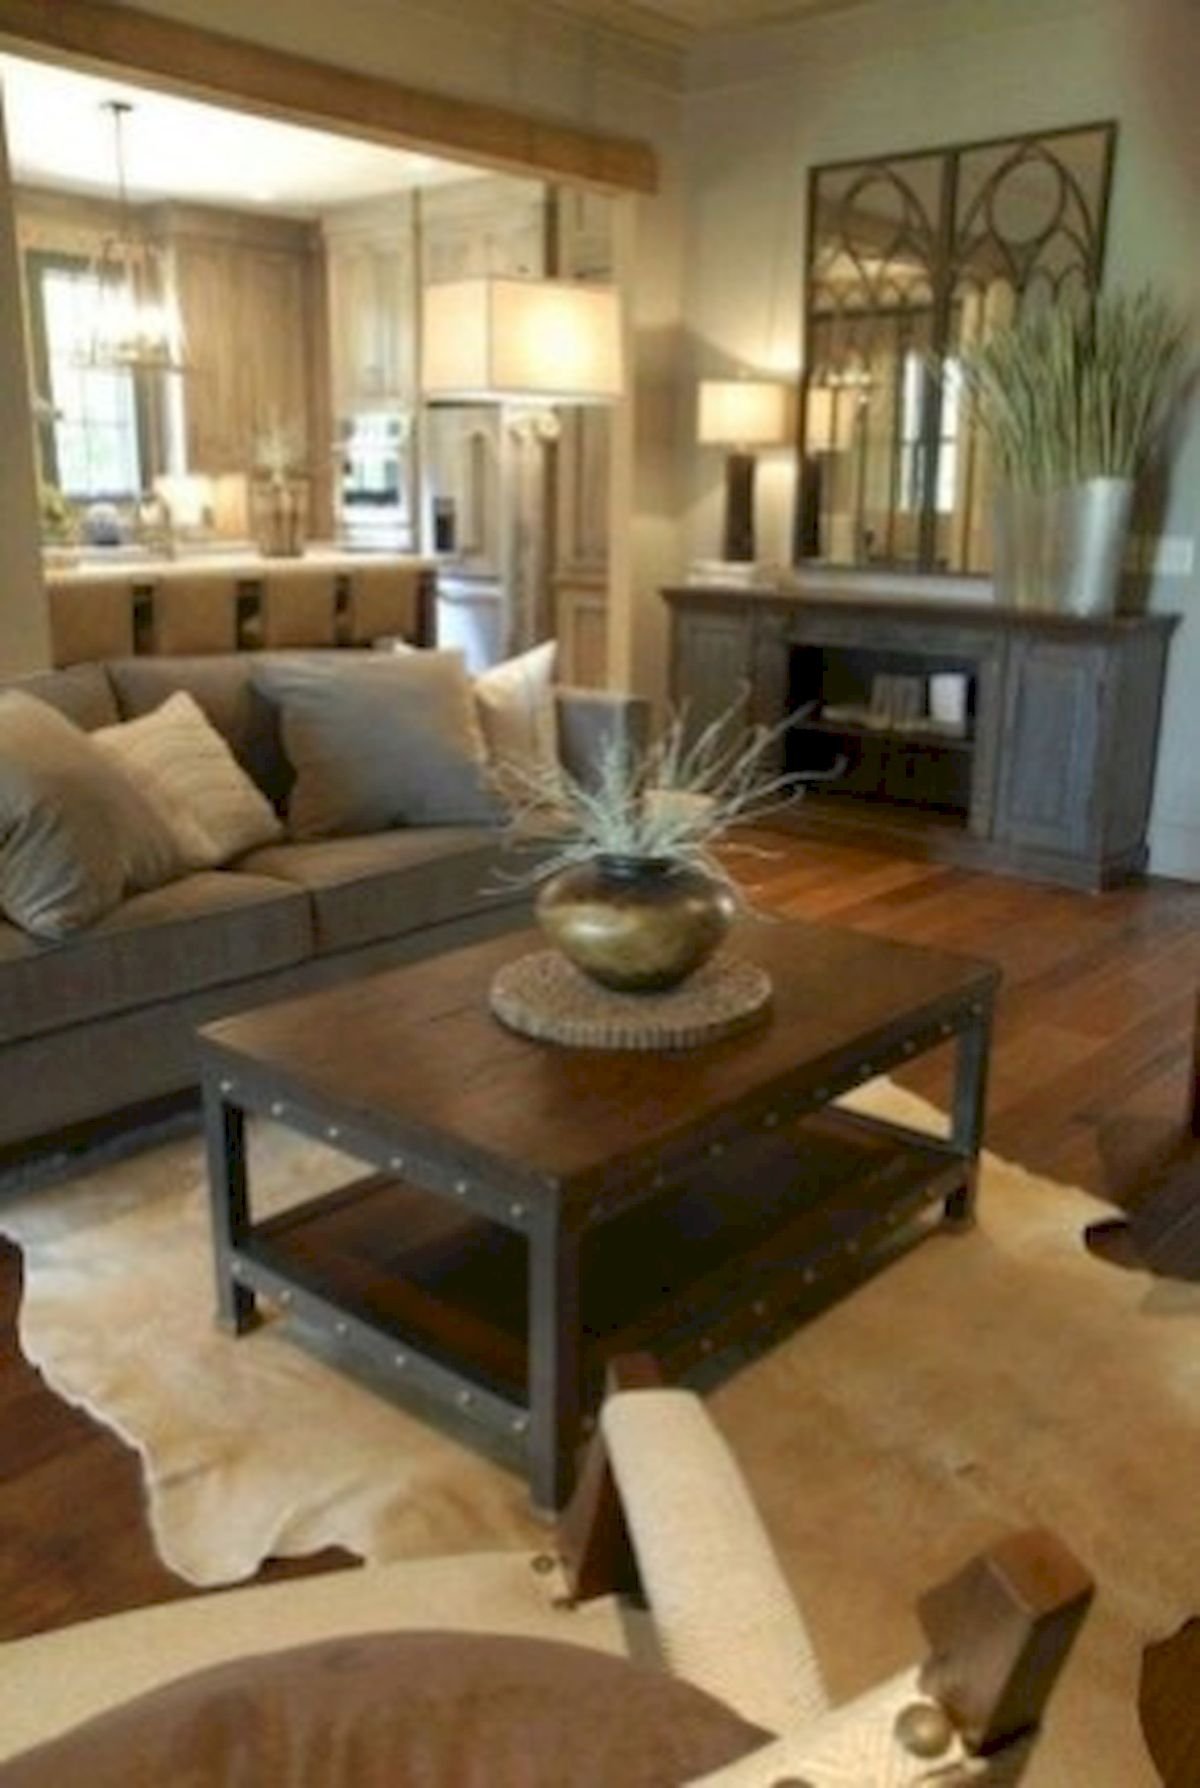 40+ Awesome Farmhouse Design Ideas For Living Room (35)